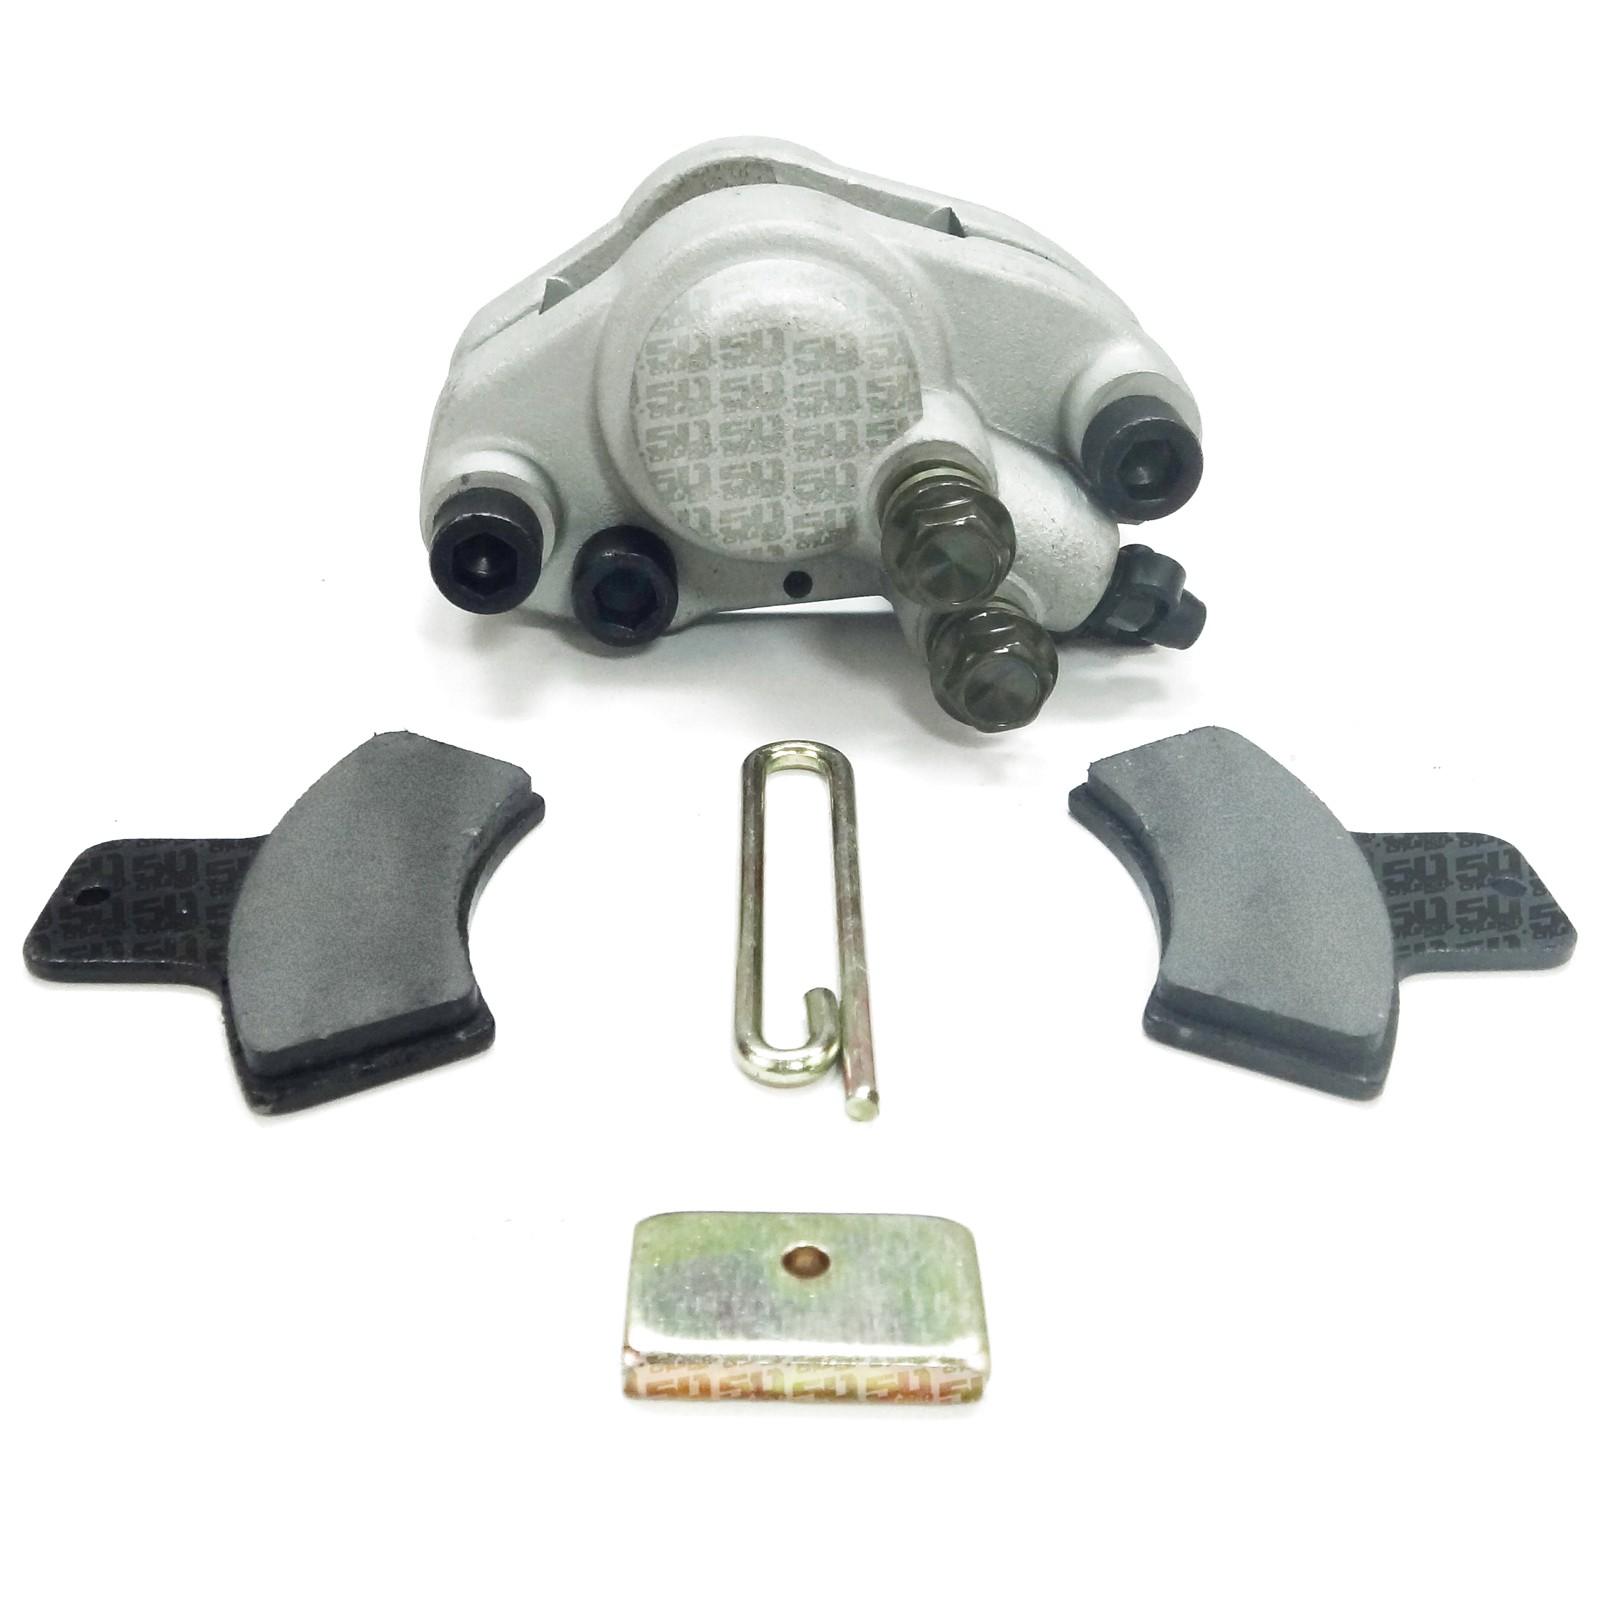 Polaris Atv Scrambler 500 2x4 And 4x4 Replacement Brake Caliper With 2006 Fuse Box Rear